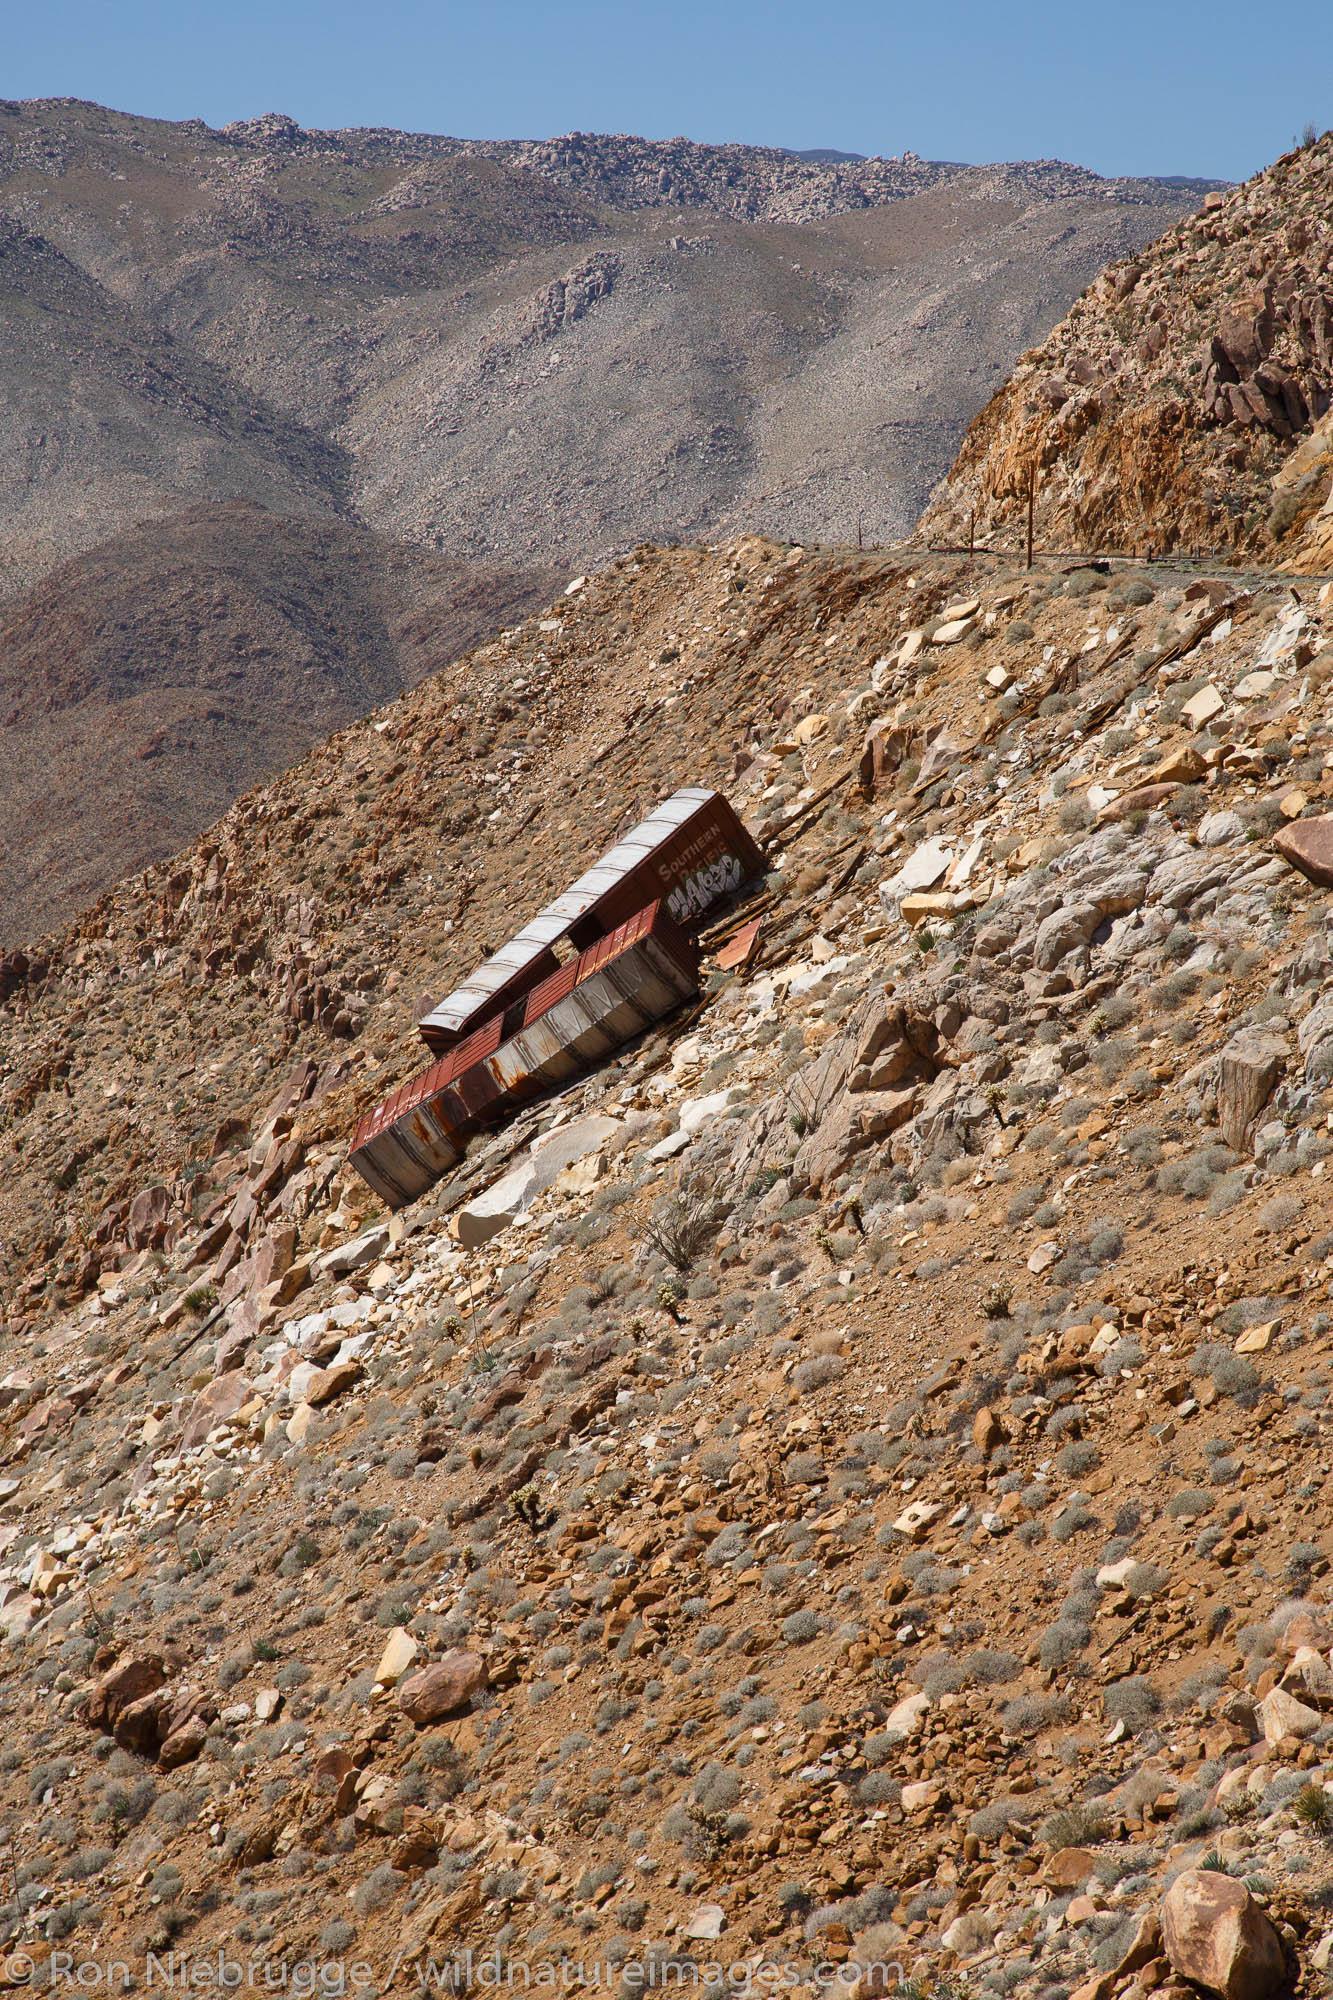 Carrizo Gorge Railroad Track, Anza-Borrego Desert State Park, California.